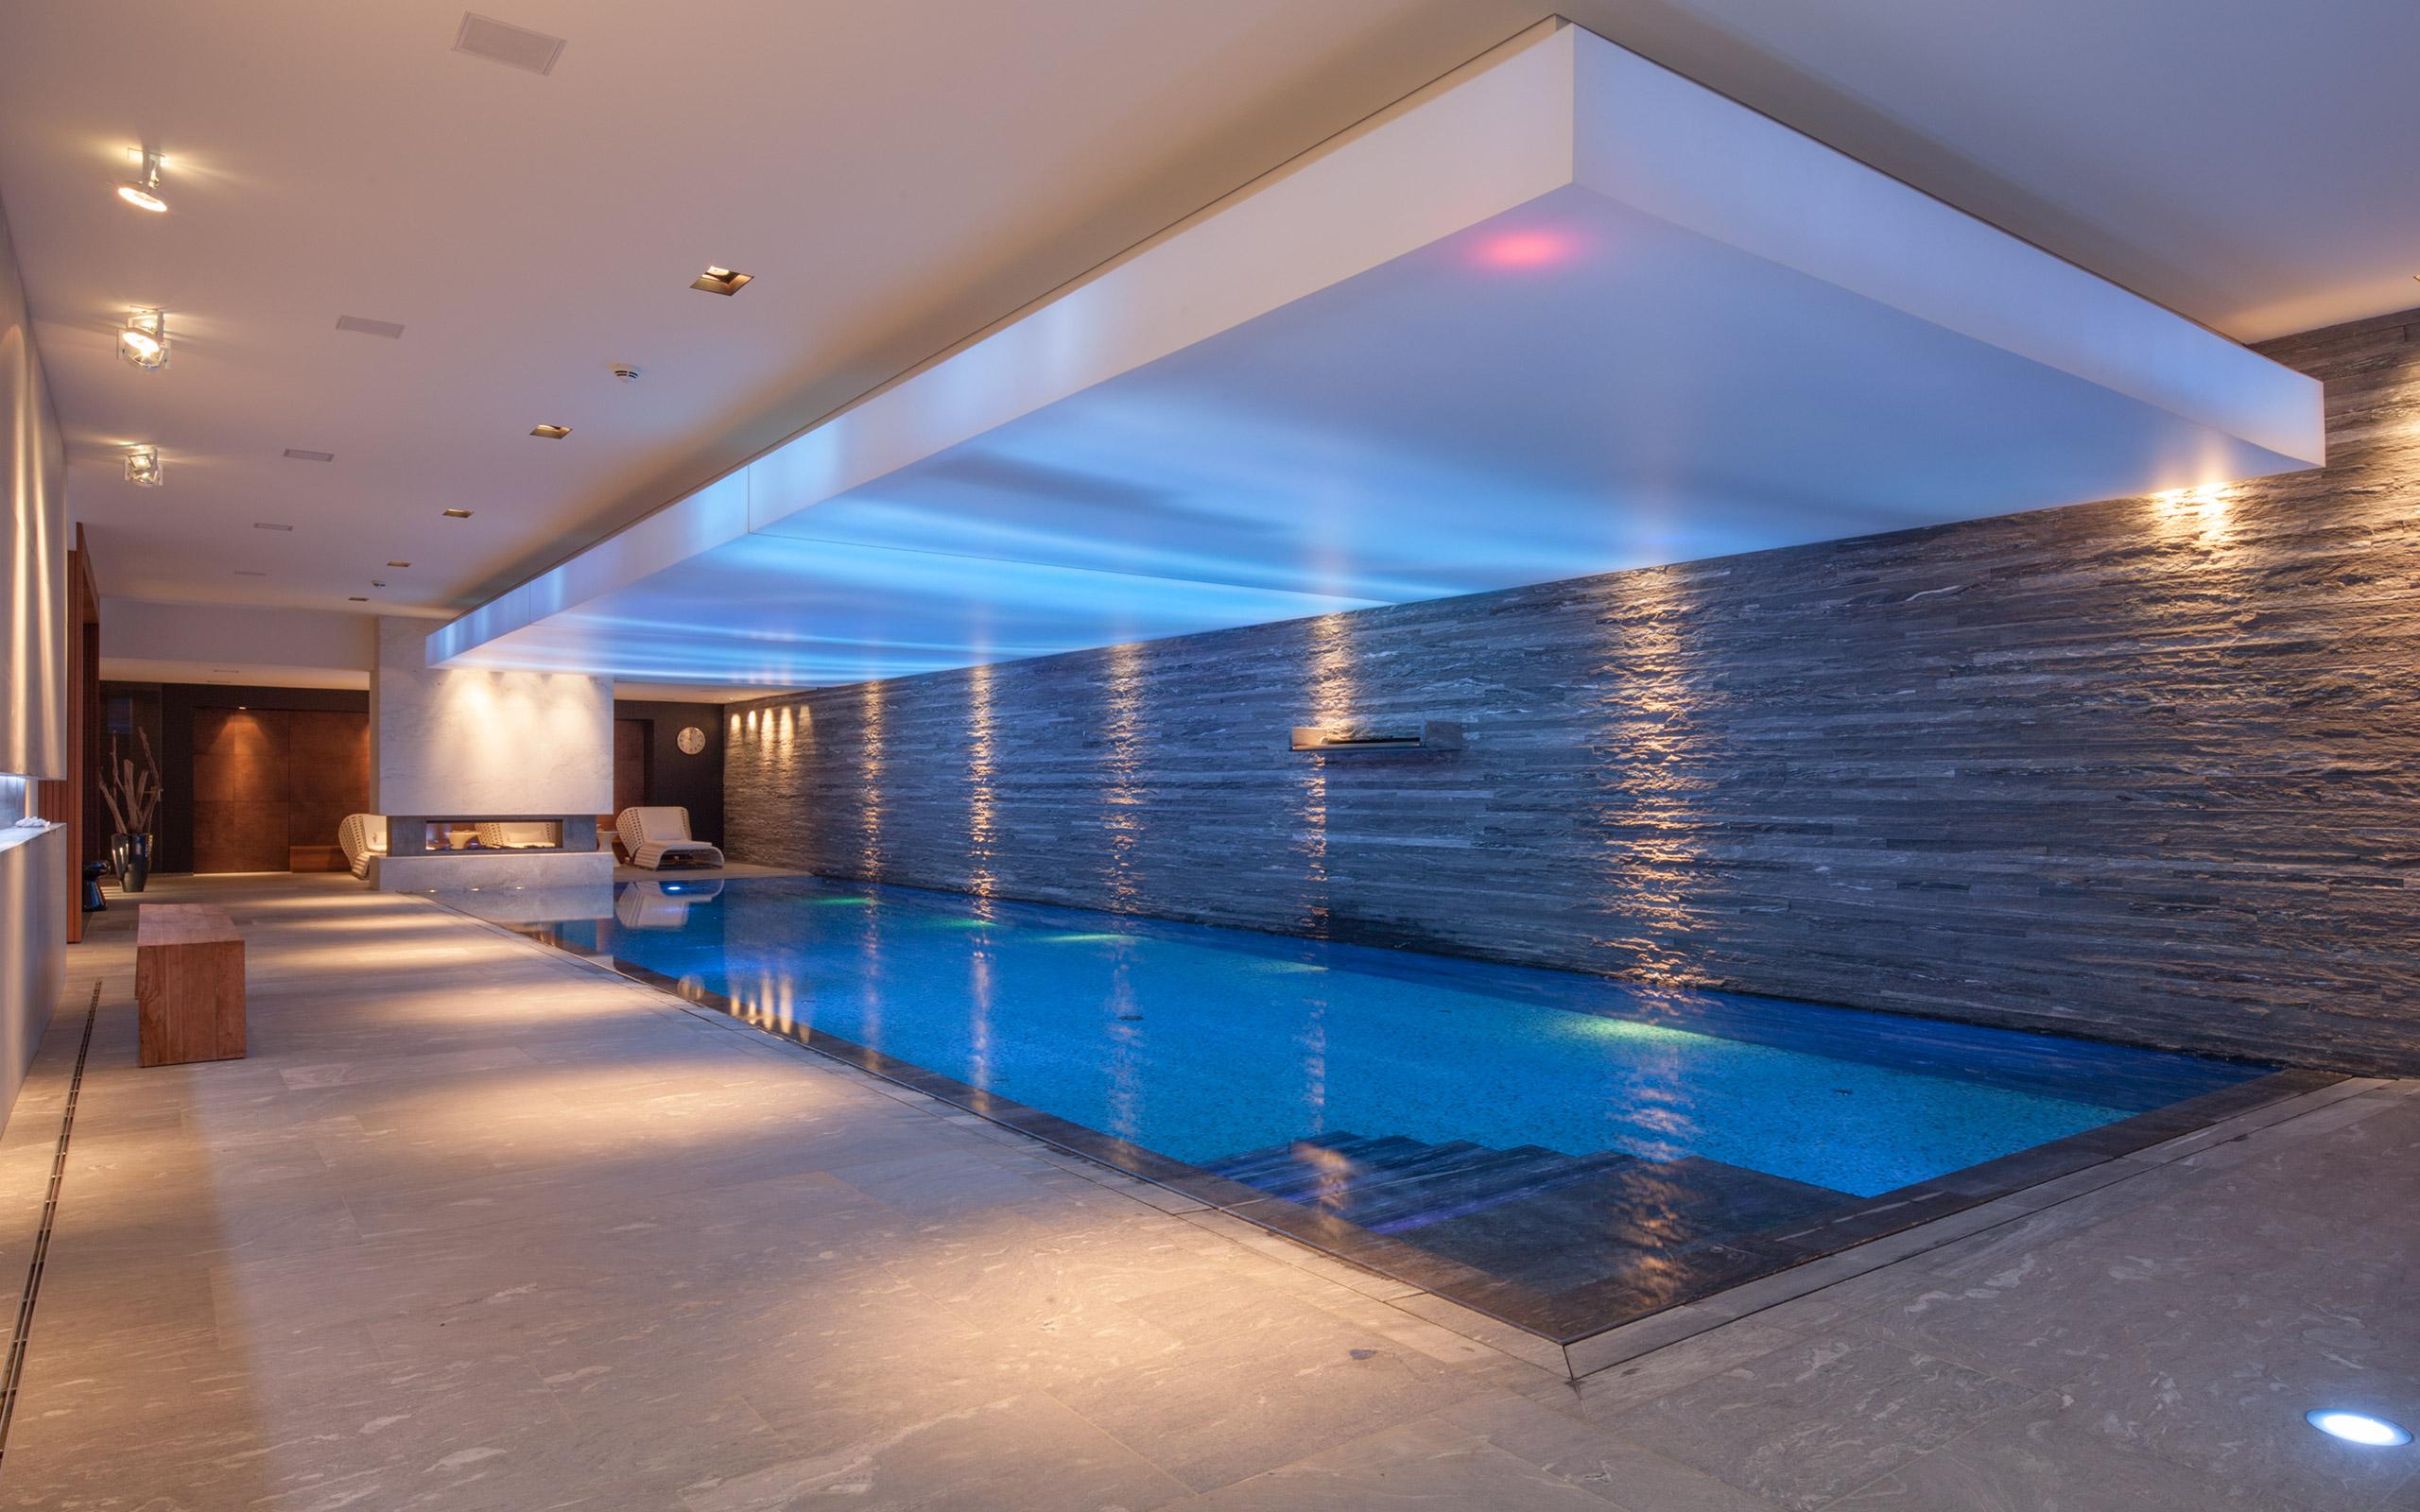 ssf pools by klafs pool whirlpool und wellness spezialist. Black Bedroom Furniture Sets. Home Design Ideas